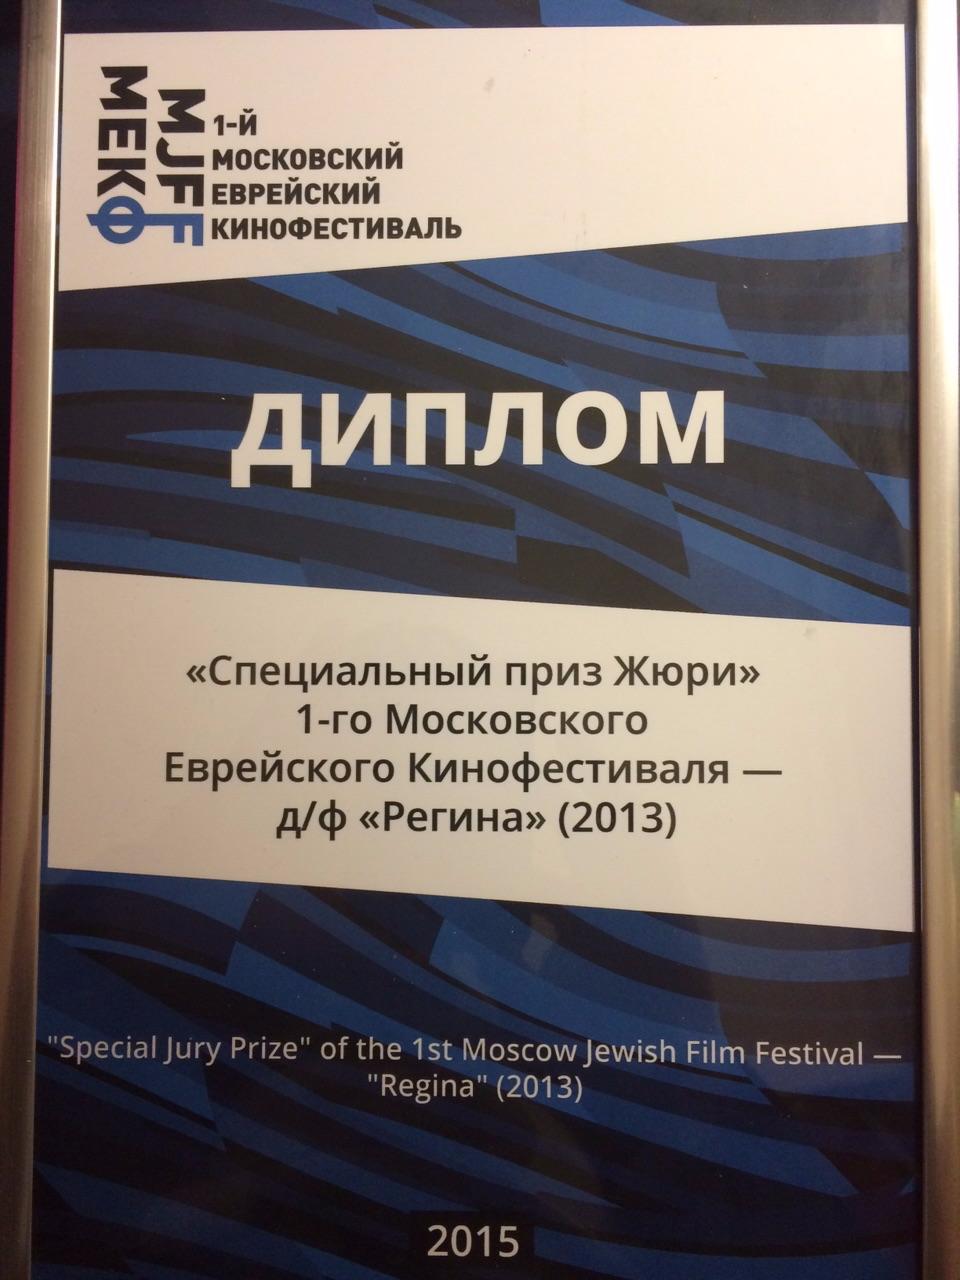 Special Jury Prize